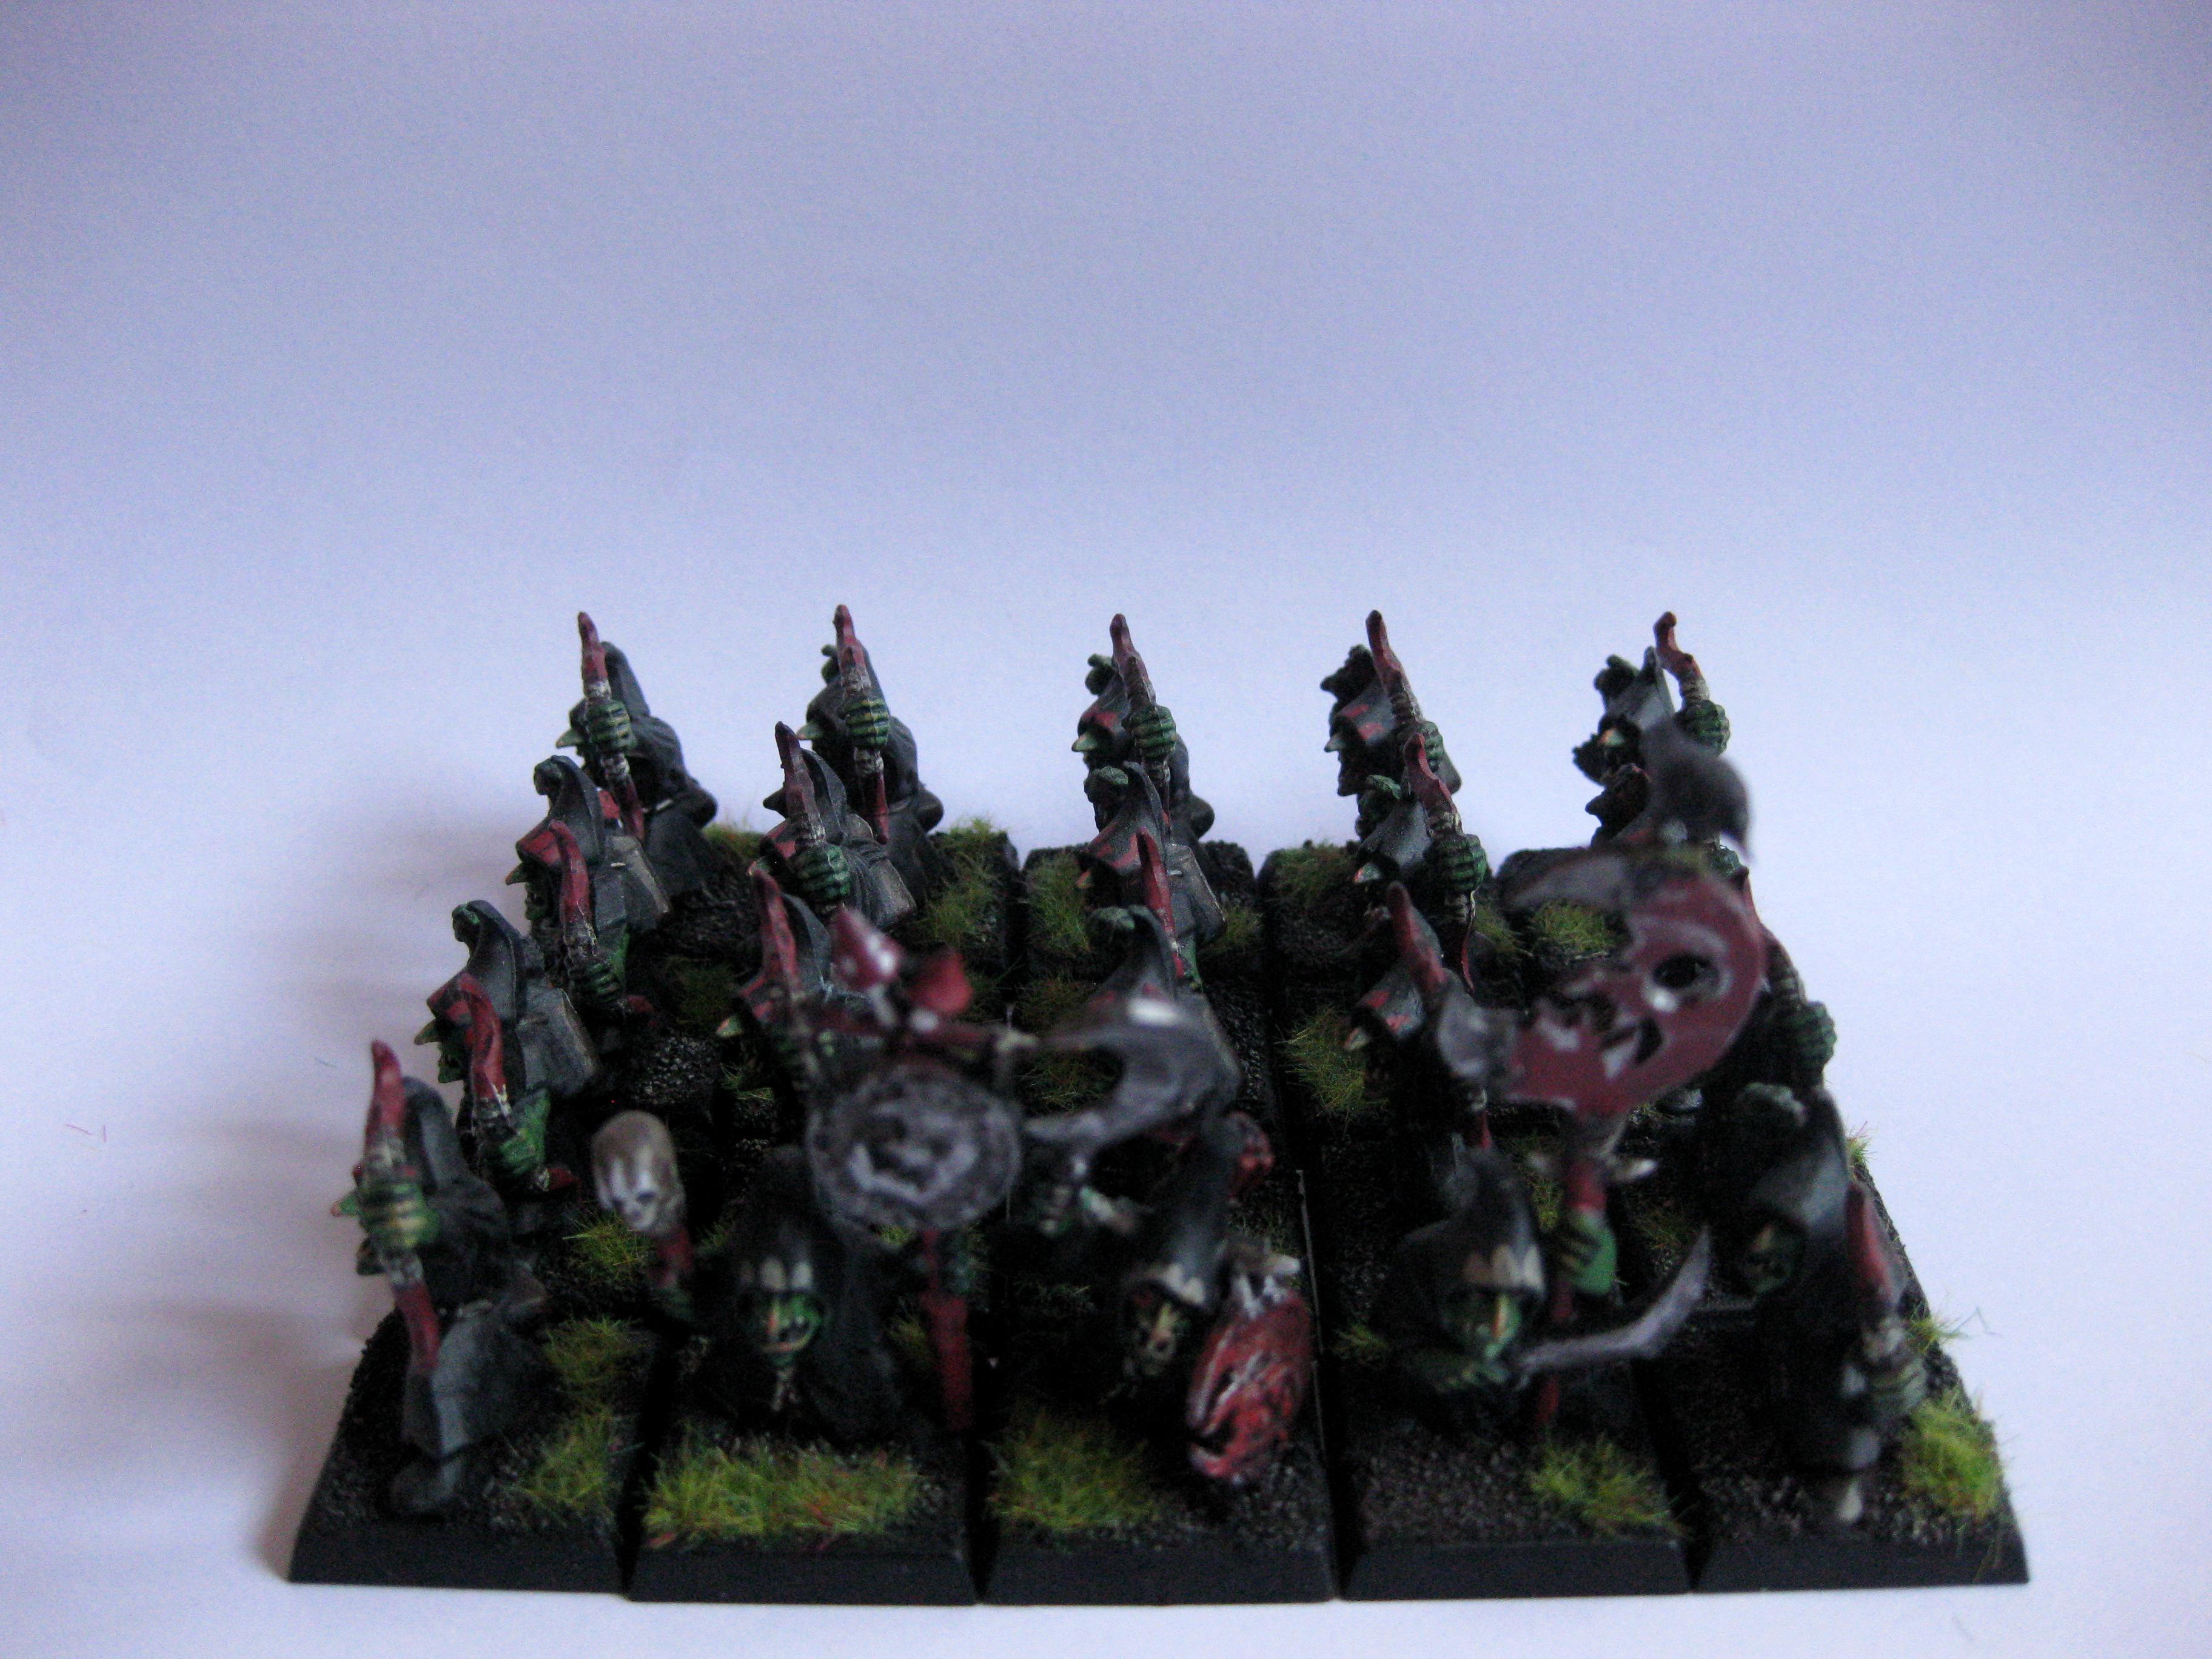 Archers, Gobbos, Goblins, Night, Warhammer Fantasy